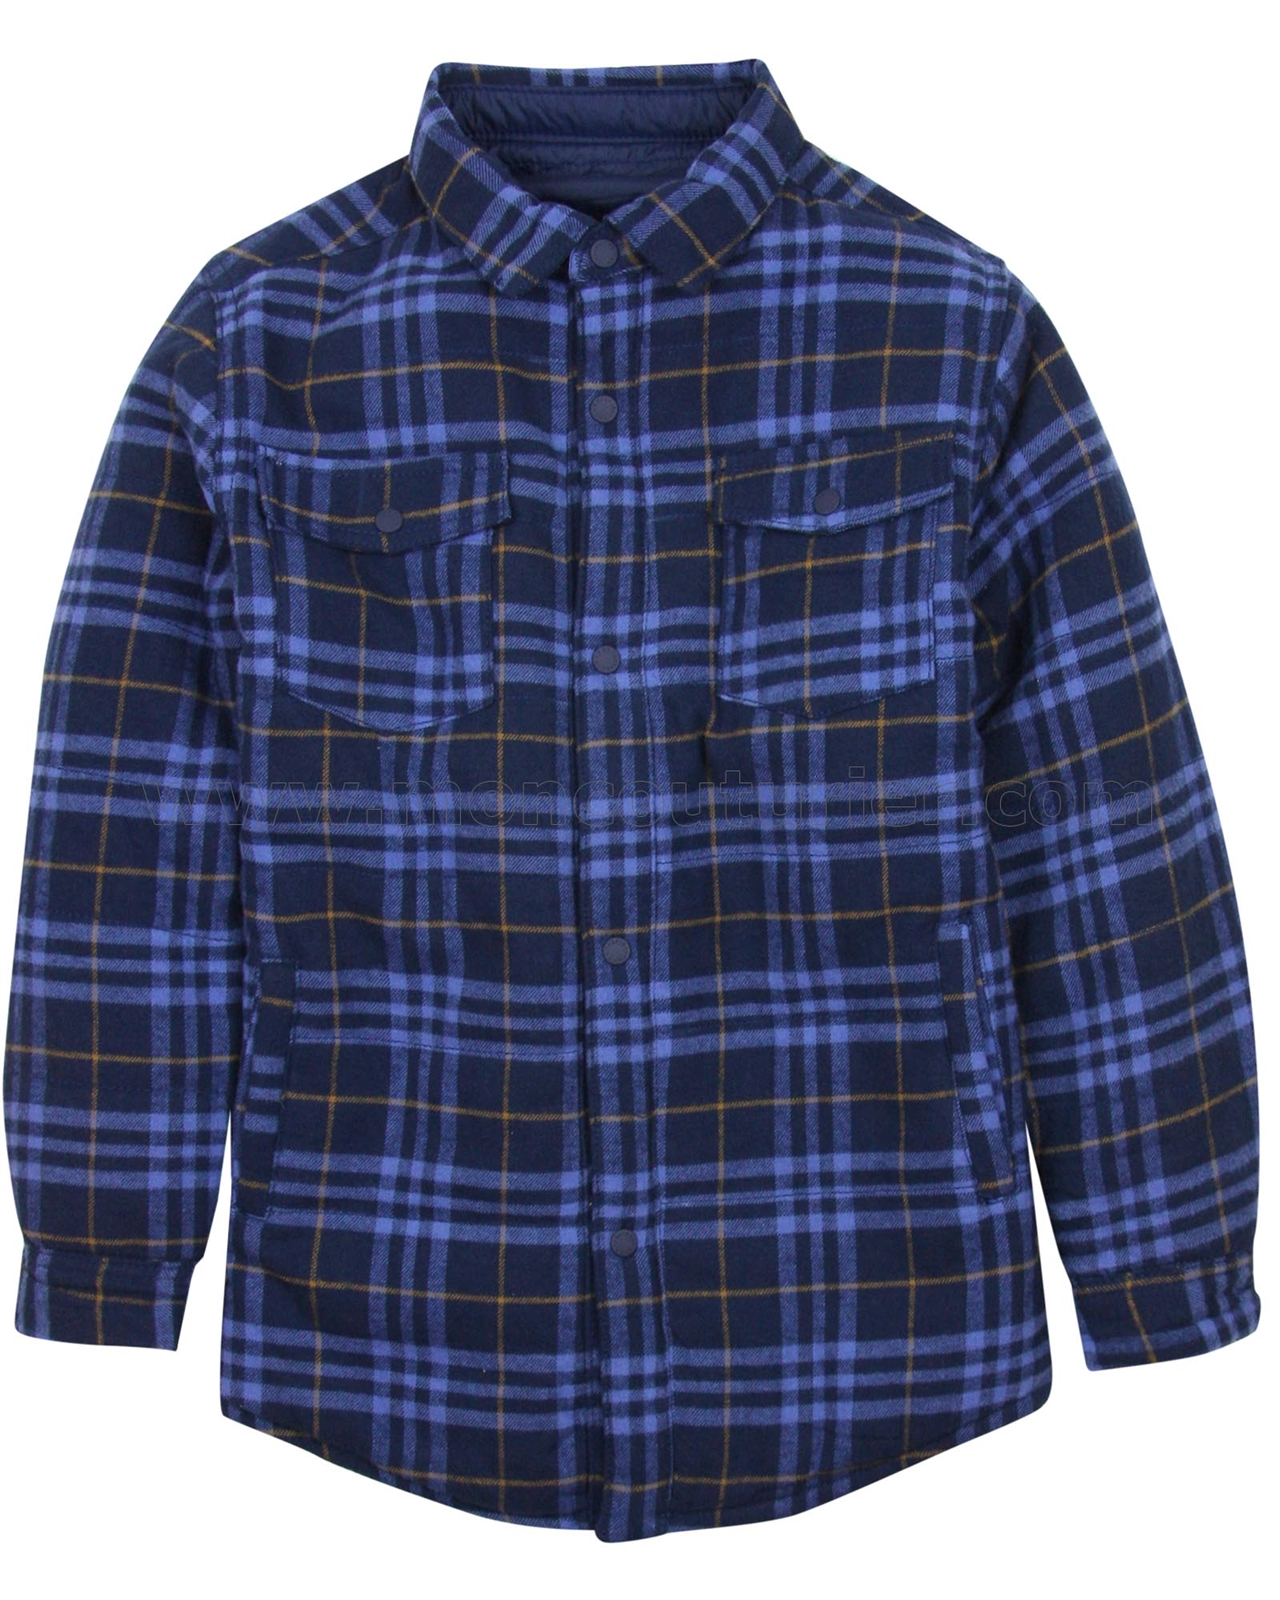 fd39591bc Mayoral Junior Boy s Reversible Plaid Shirt Jacket - Mayoral ...